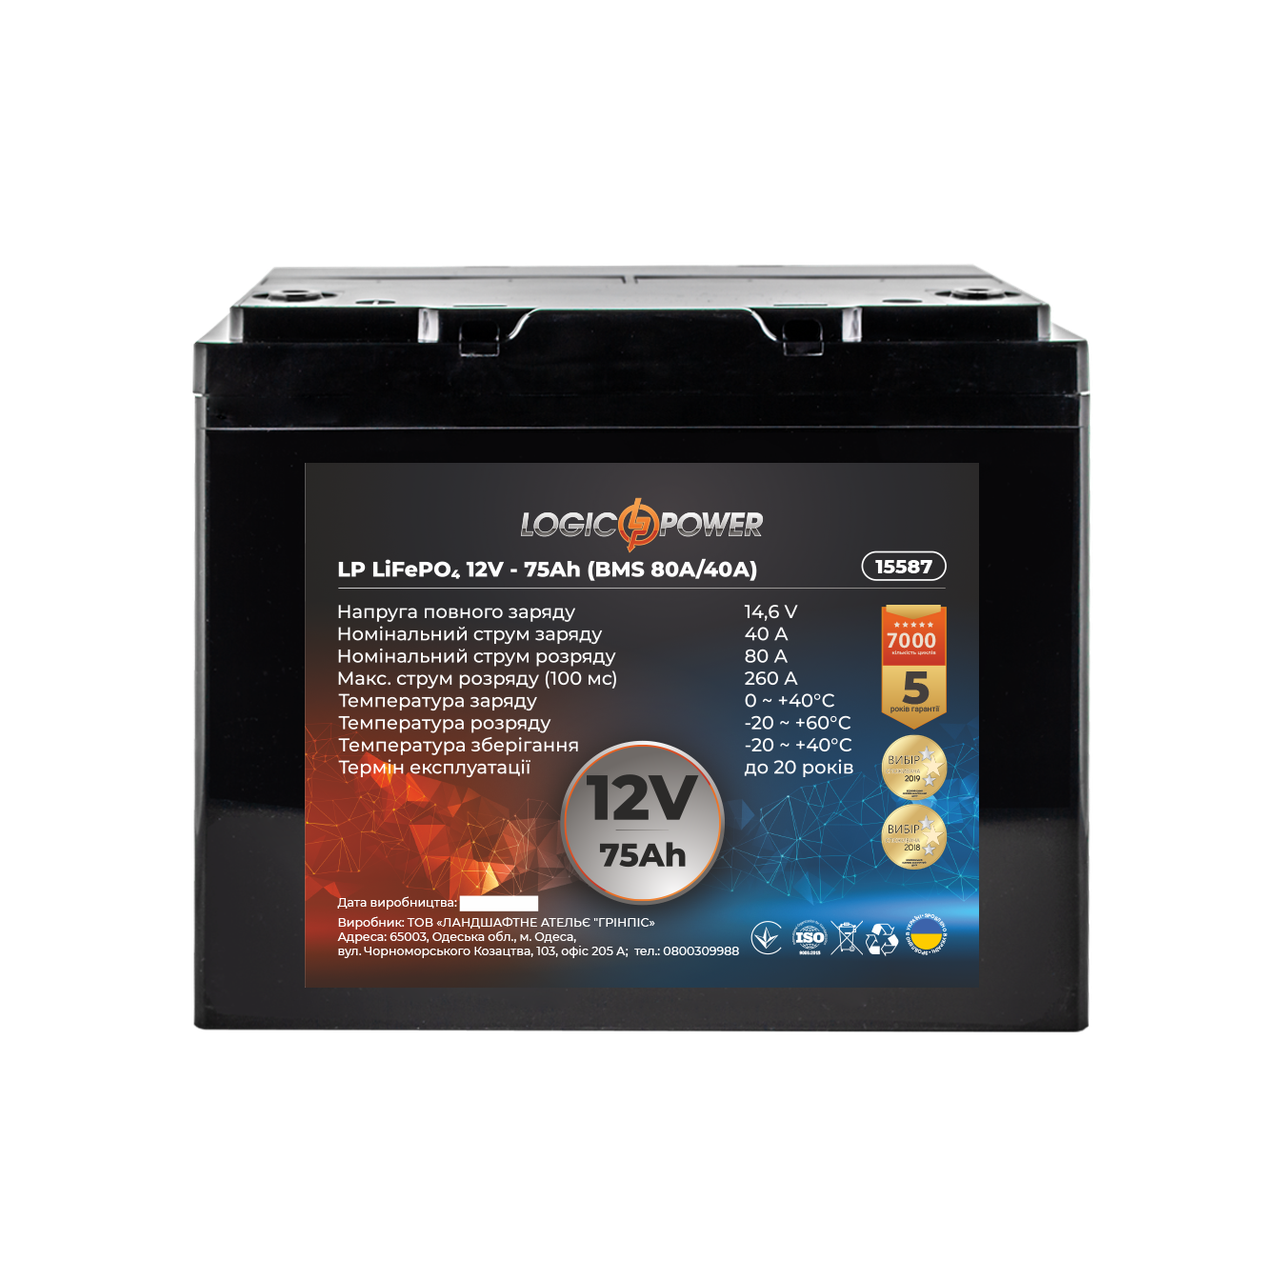 Акумулятор LP LiFePO4 12V - 75 Ah (BMS 80А/40A) пластик